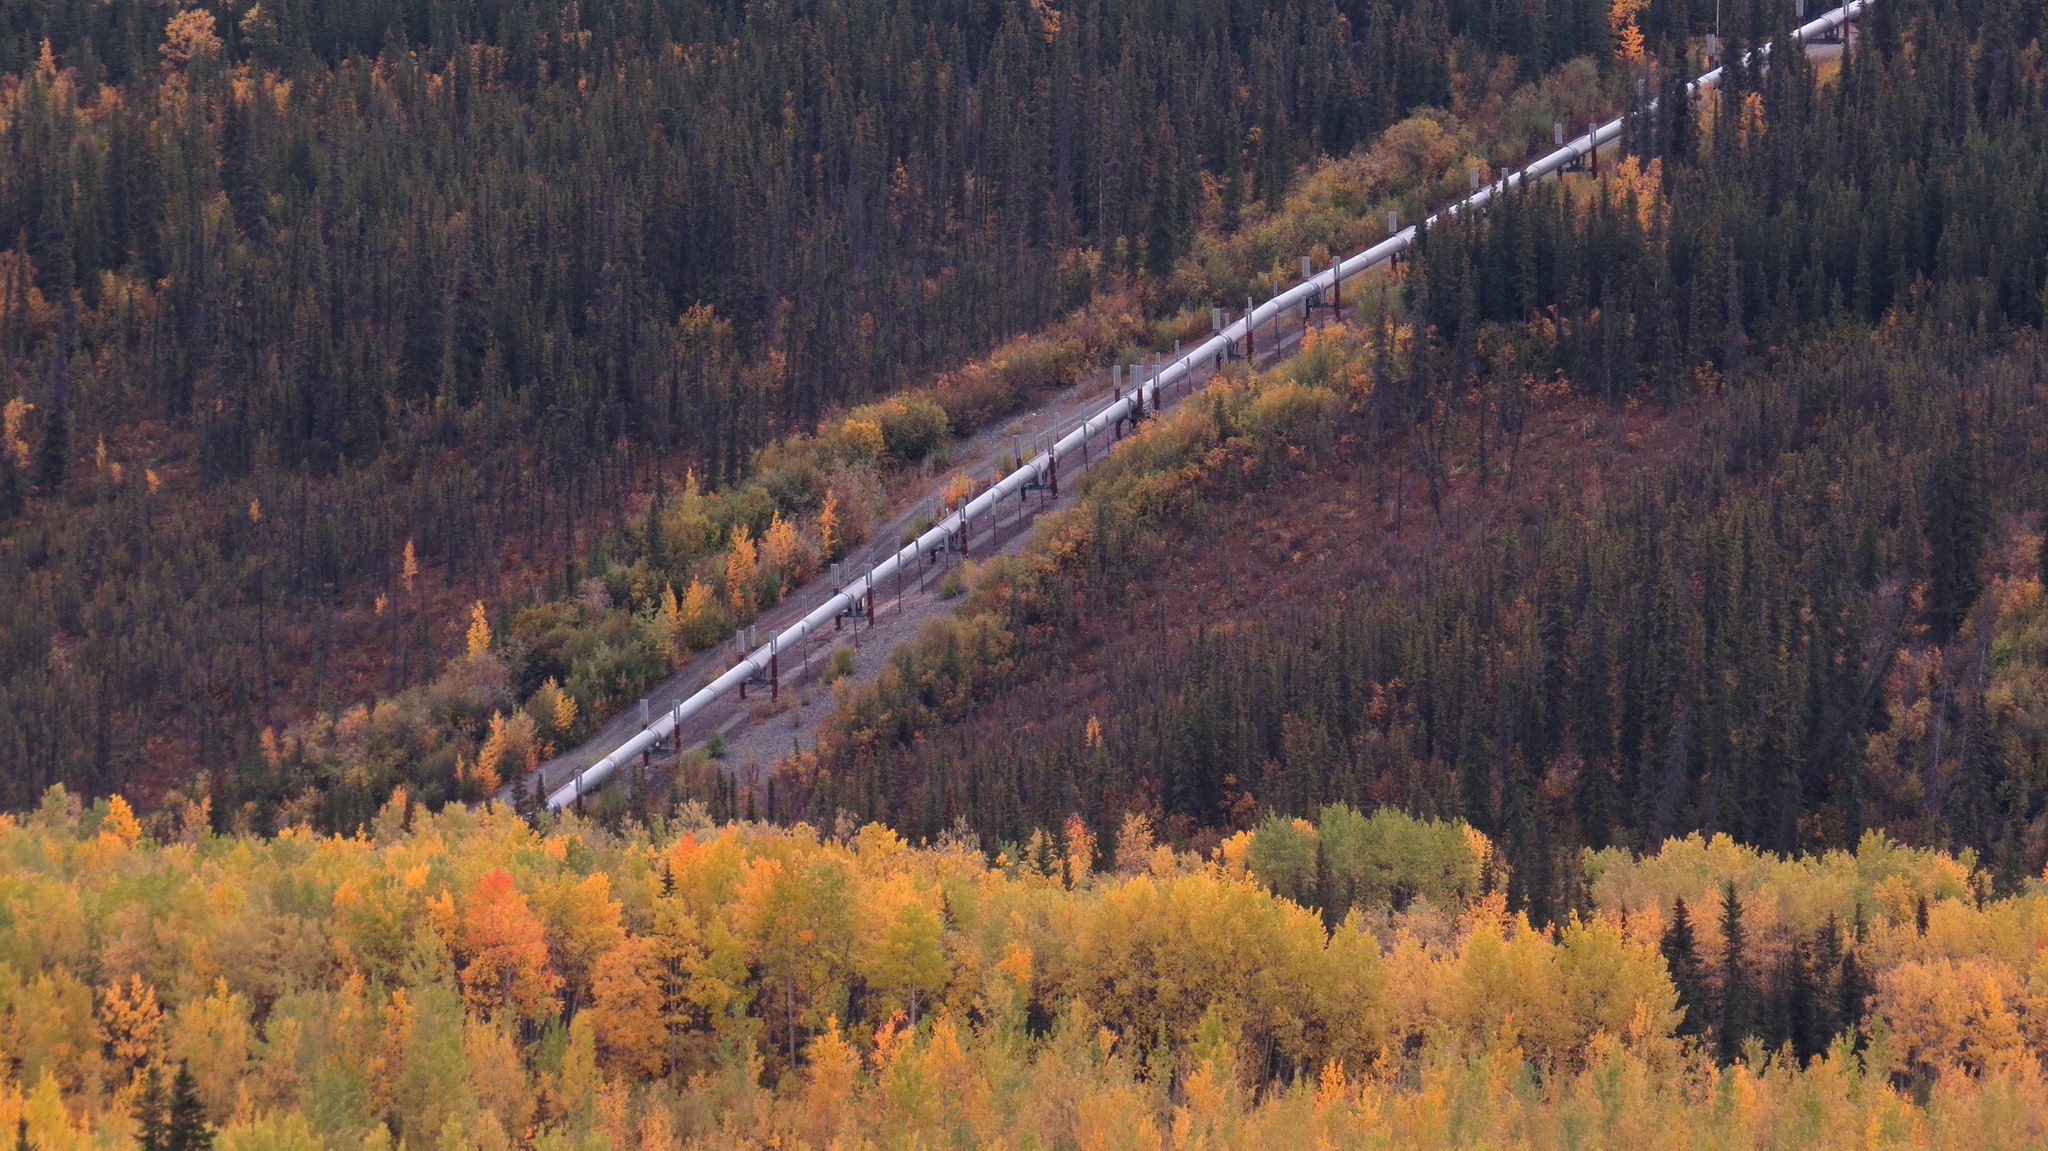 An oil pipeline near the Copper River in Alaska. Photo: Luke Jones.